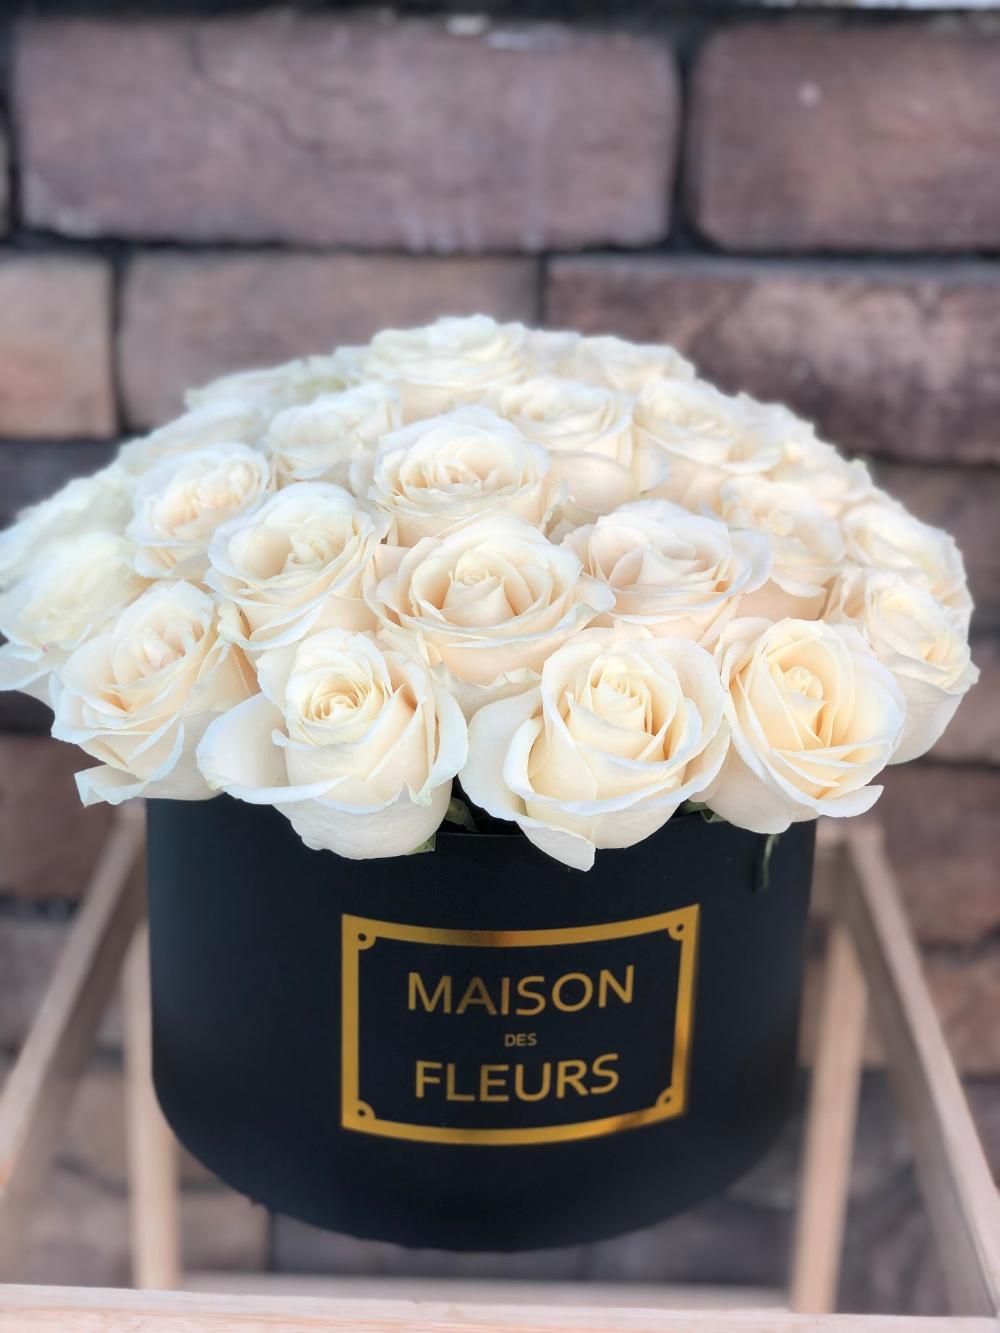 White Roses In A Black Box Flower White Roses Gift Beautiful Rose Flowers White Roses